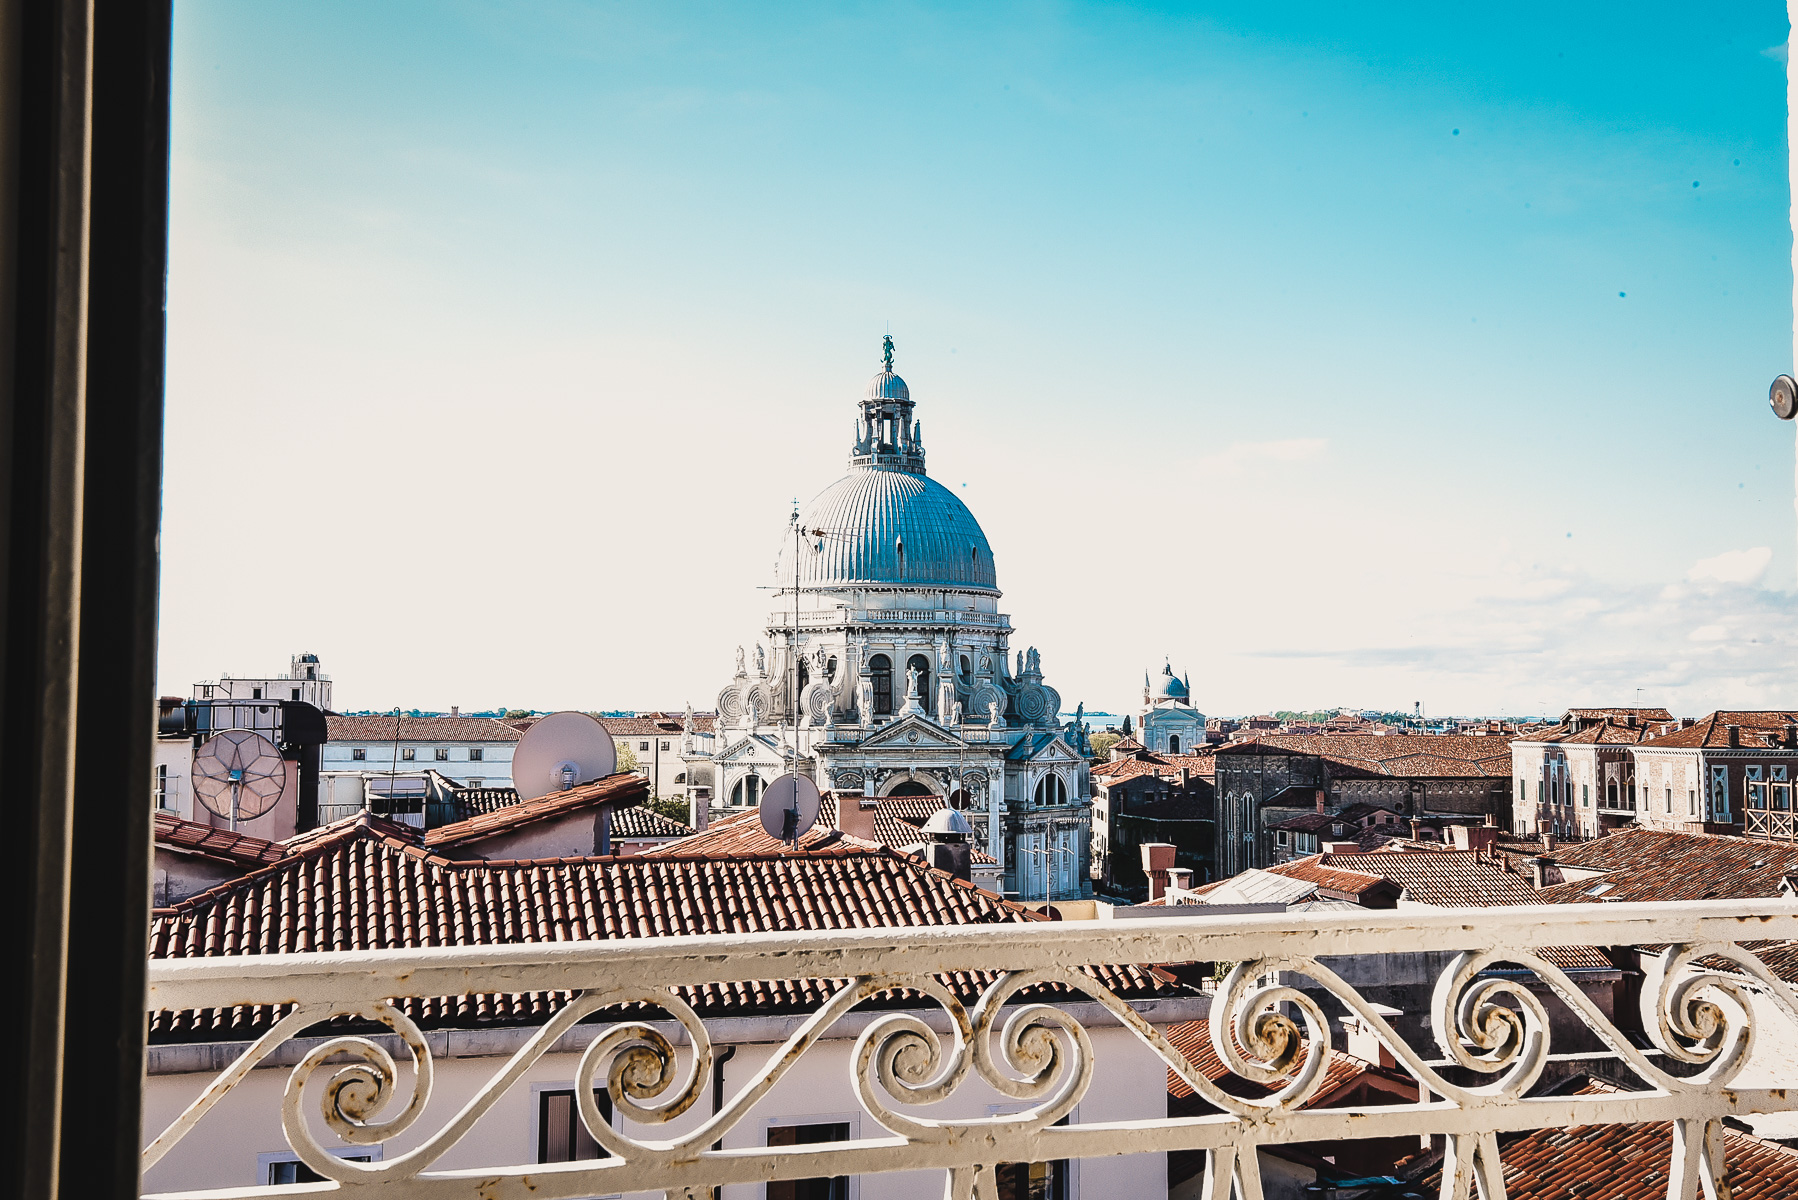 Tommeezjerry-Maennermodeblog-Maennermode-Fashionblog-Styleblog-Berlinblog--Lifestyleblog-Travelblog-Travel-Venedig-Venice-Italy-Traveldiary-Booking-Com-